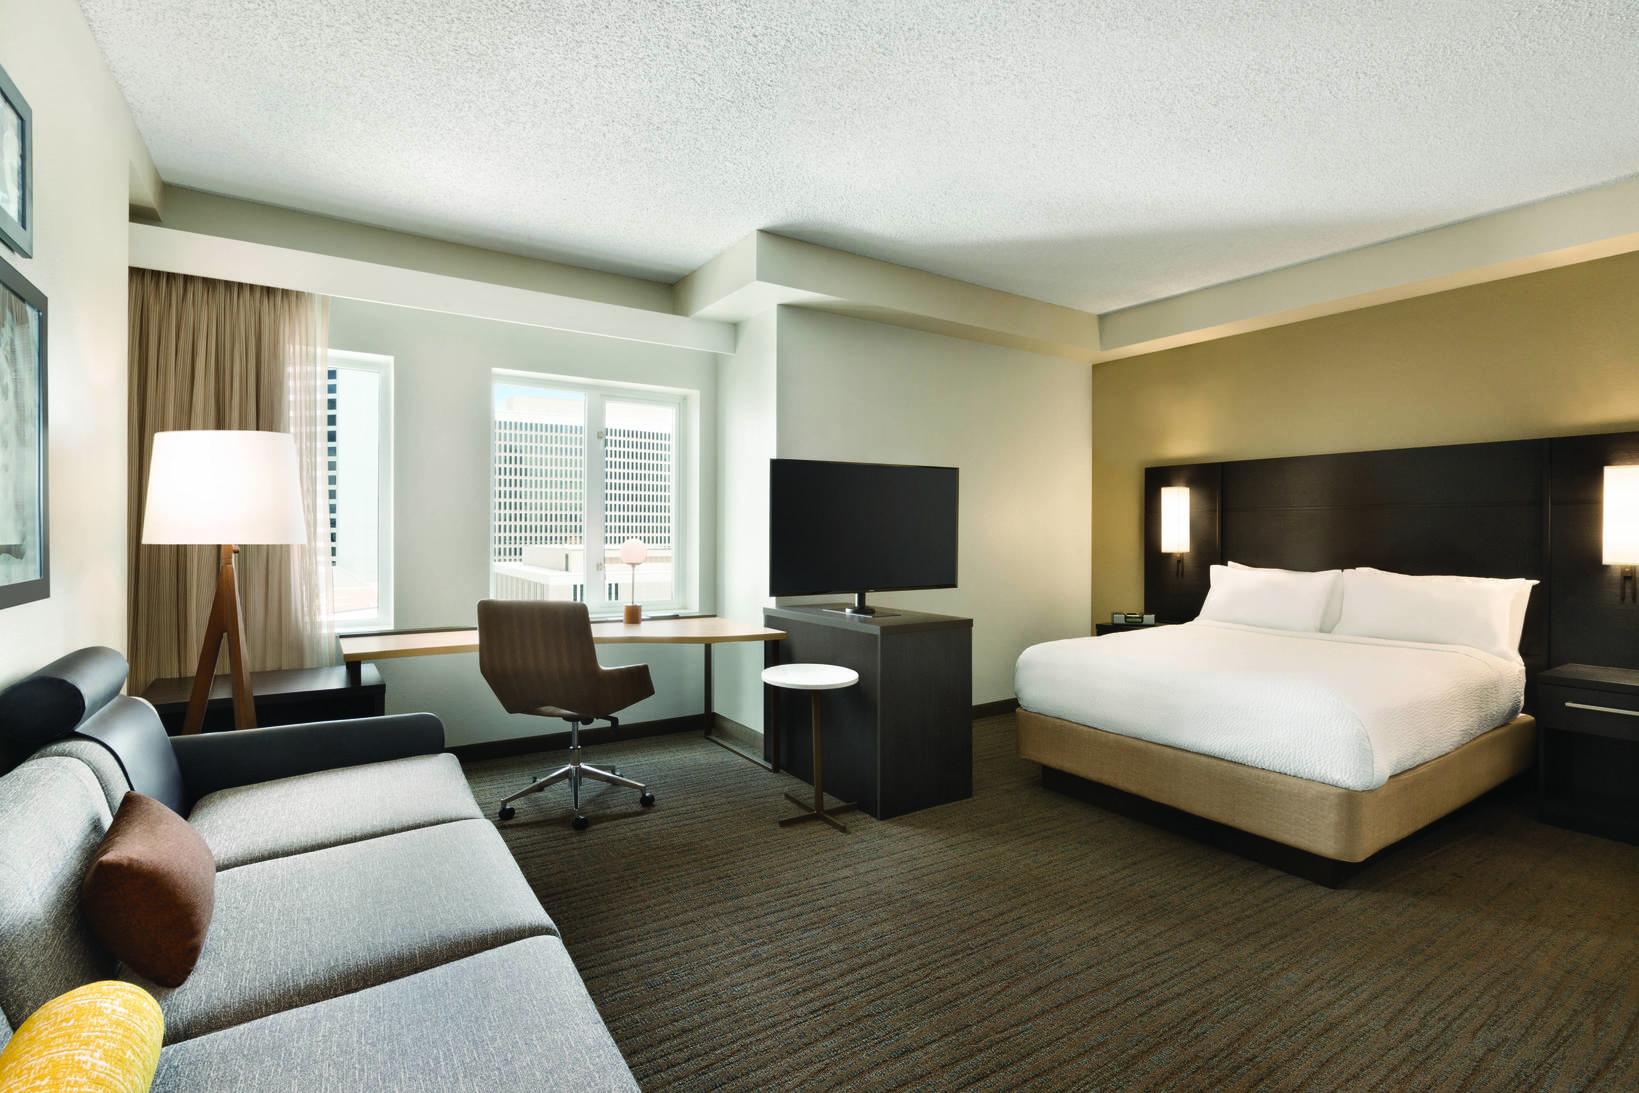 Cheap 420 Friendly Hotels